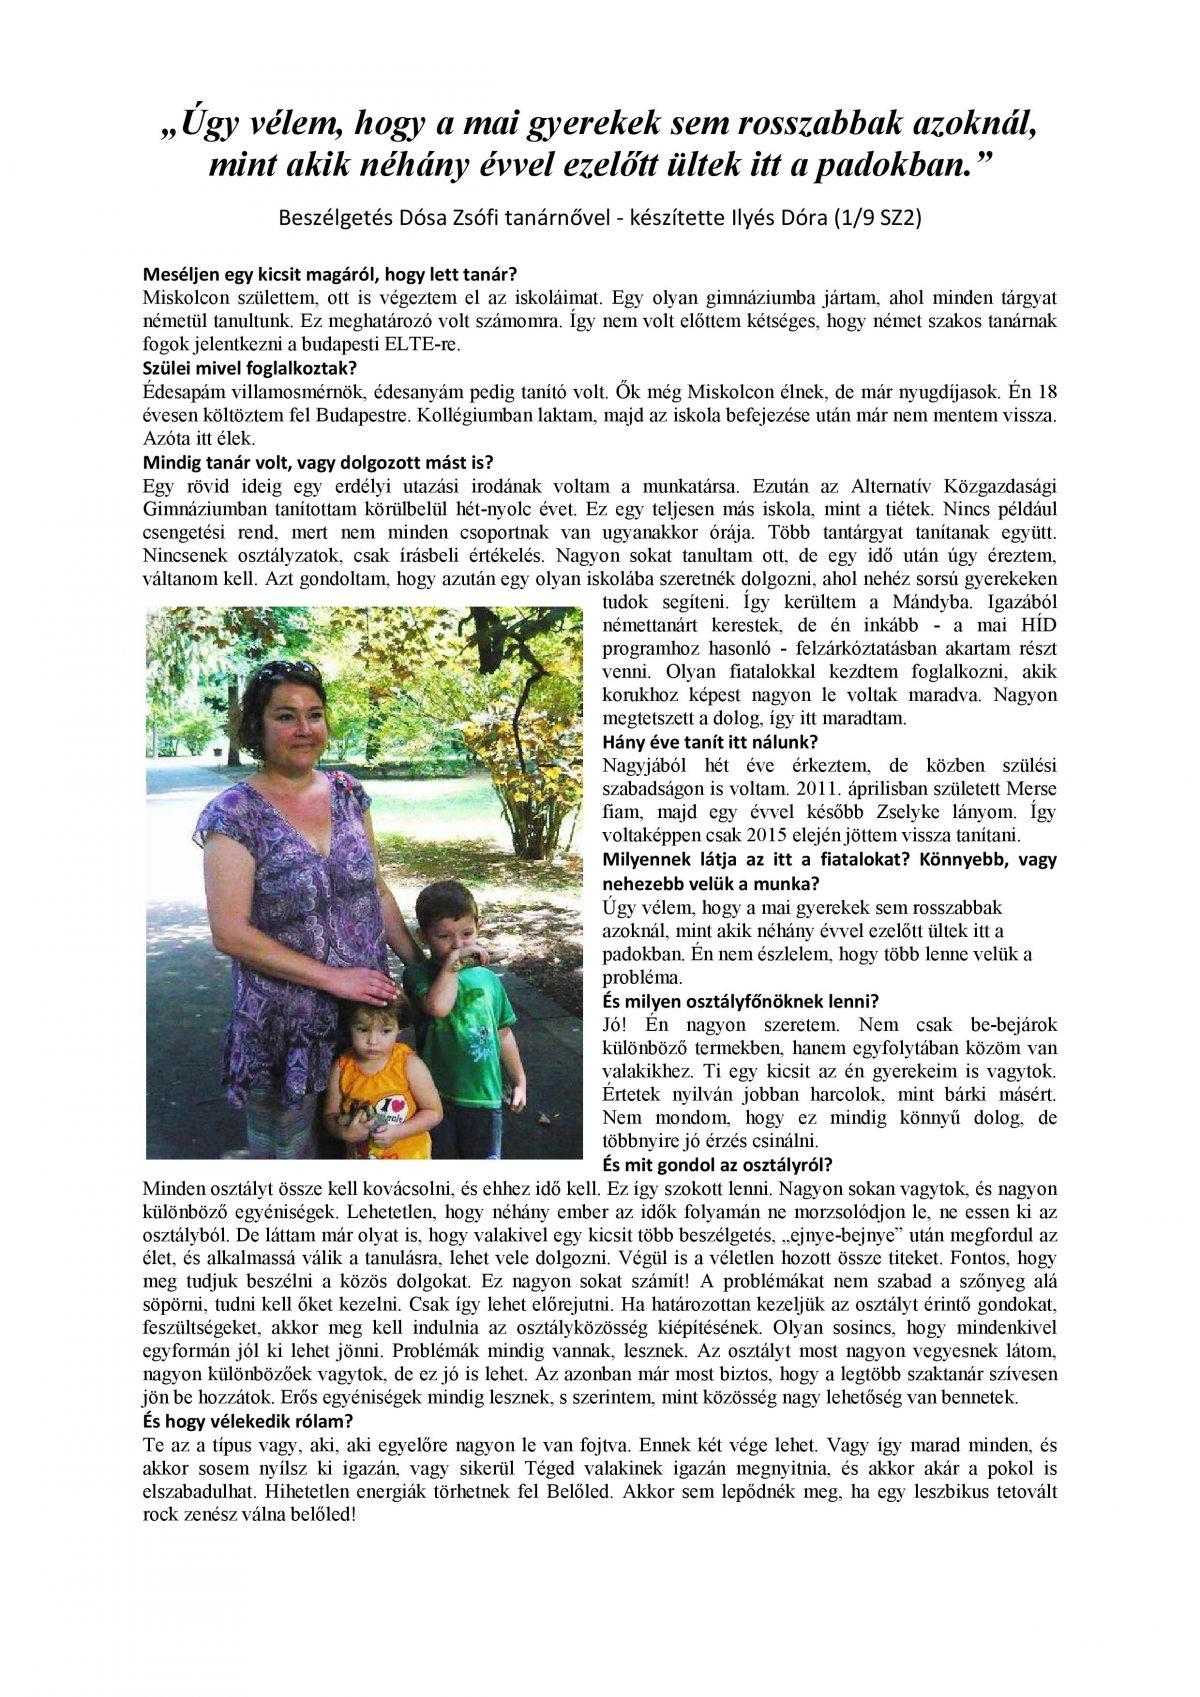 http://mandysuli.bkszc.hu/wp-content/uploads/2016/09/14.oldal-page-001-1200x1697.jpg